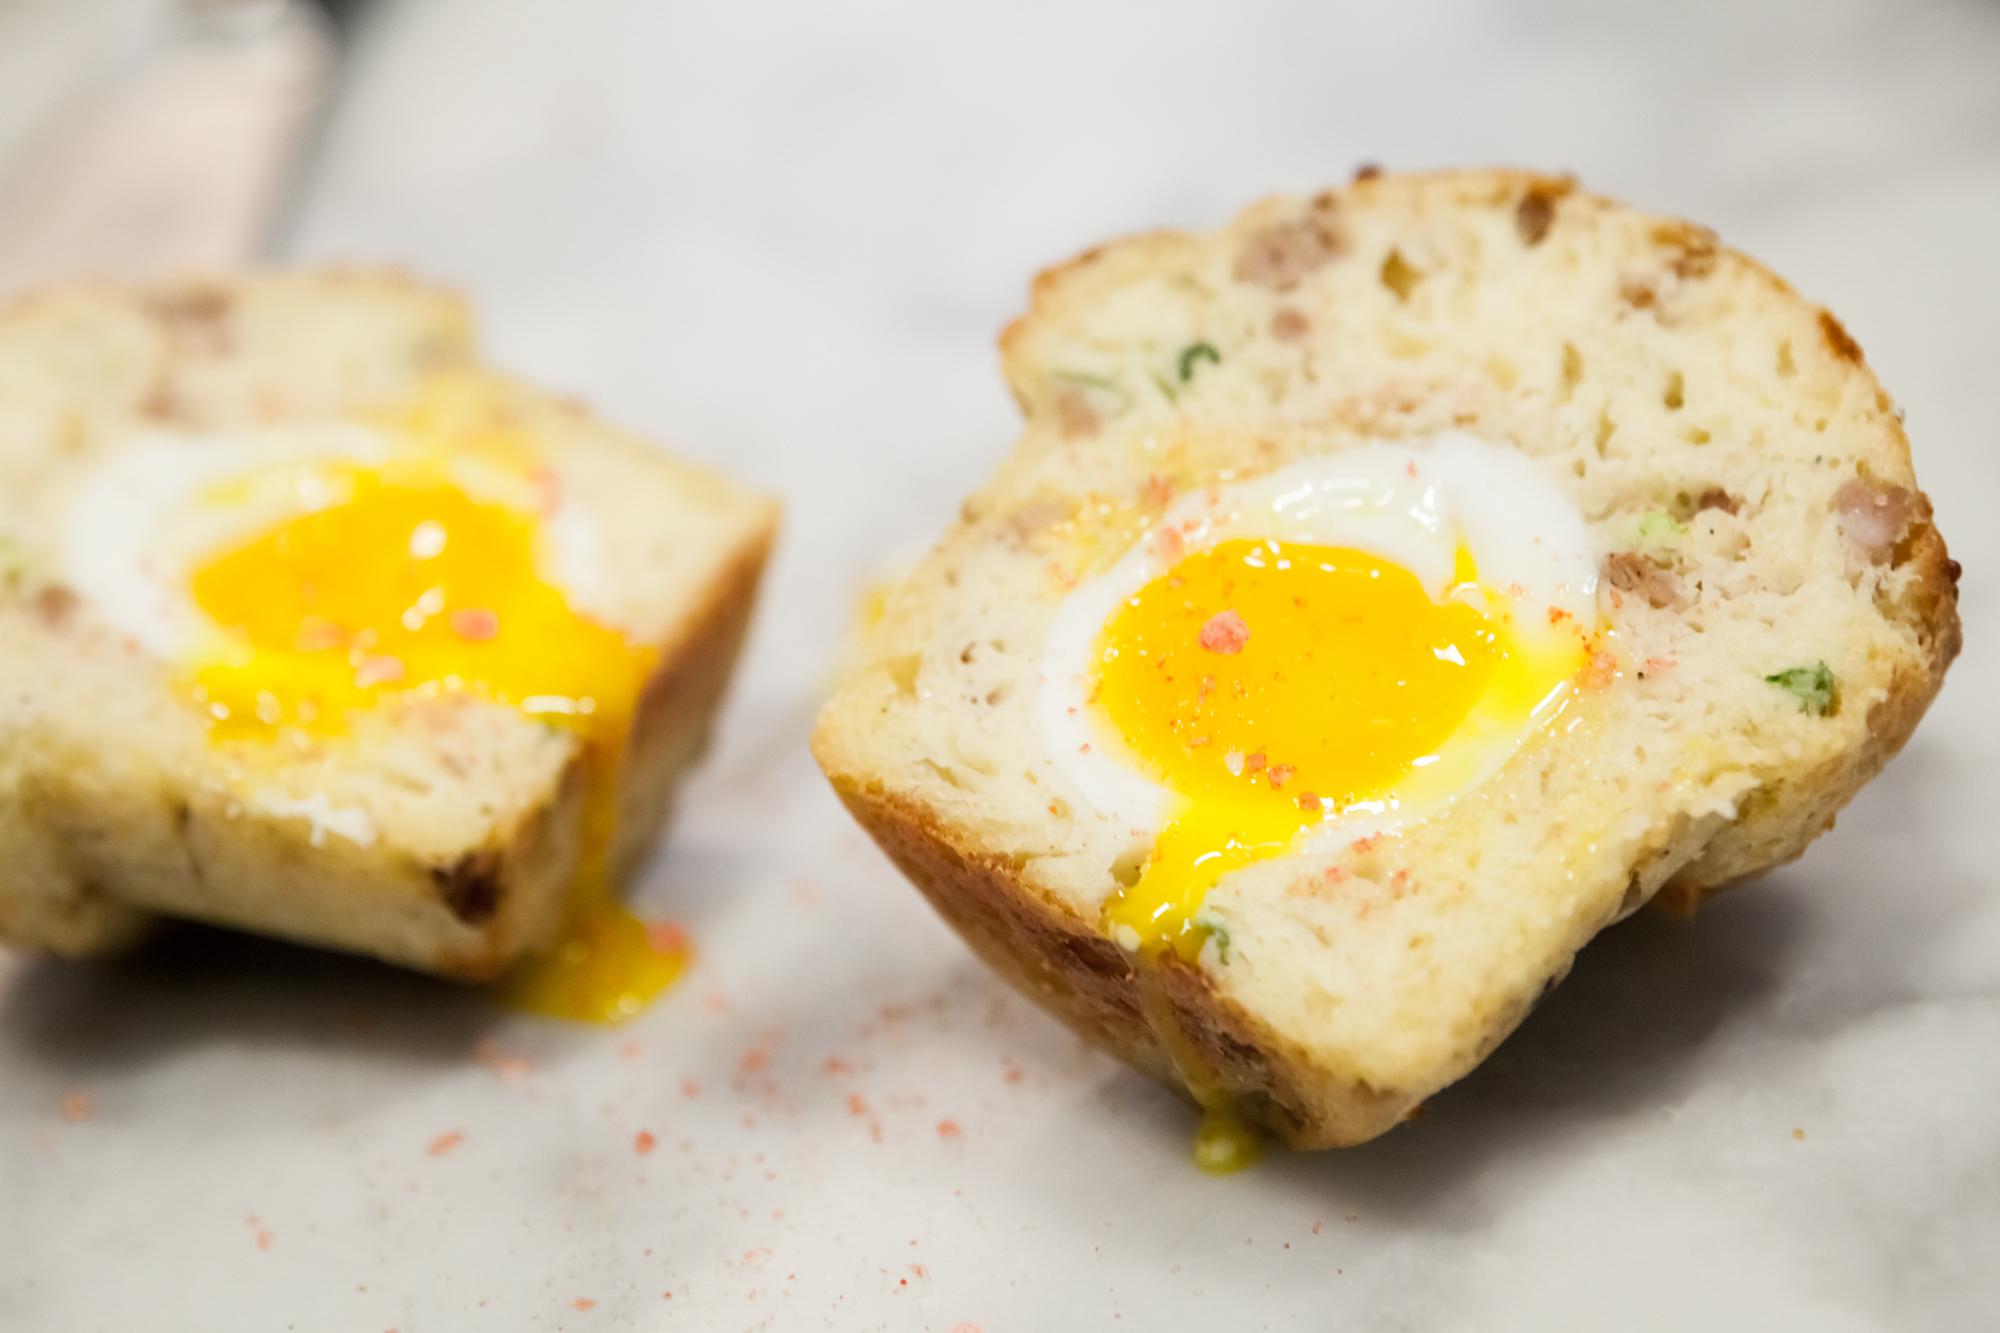 Breakfast Week Recap: Free School Meals, Bodega Bagels, Breakfast Soup